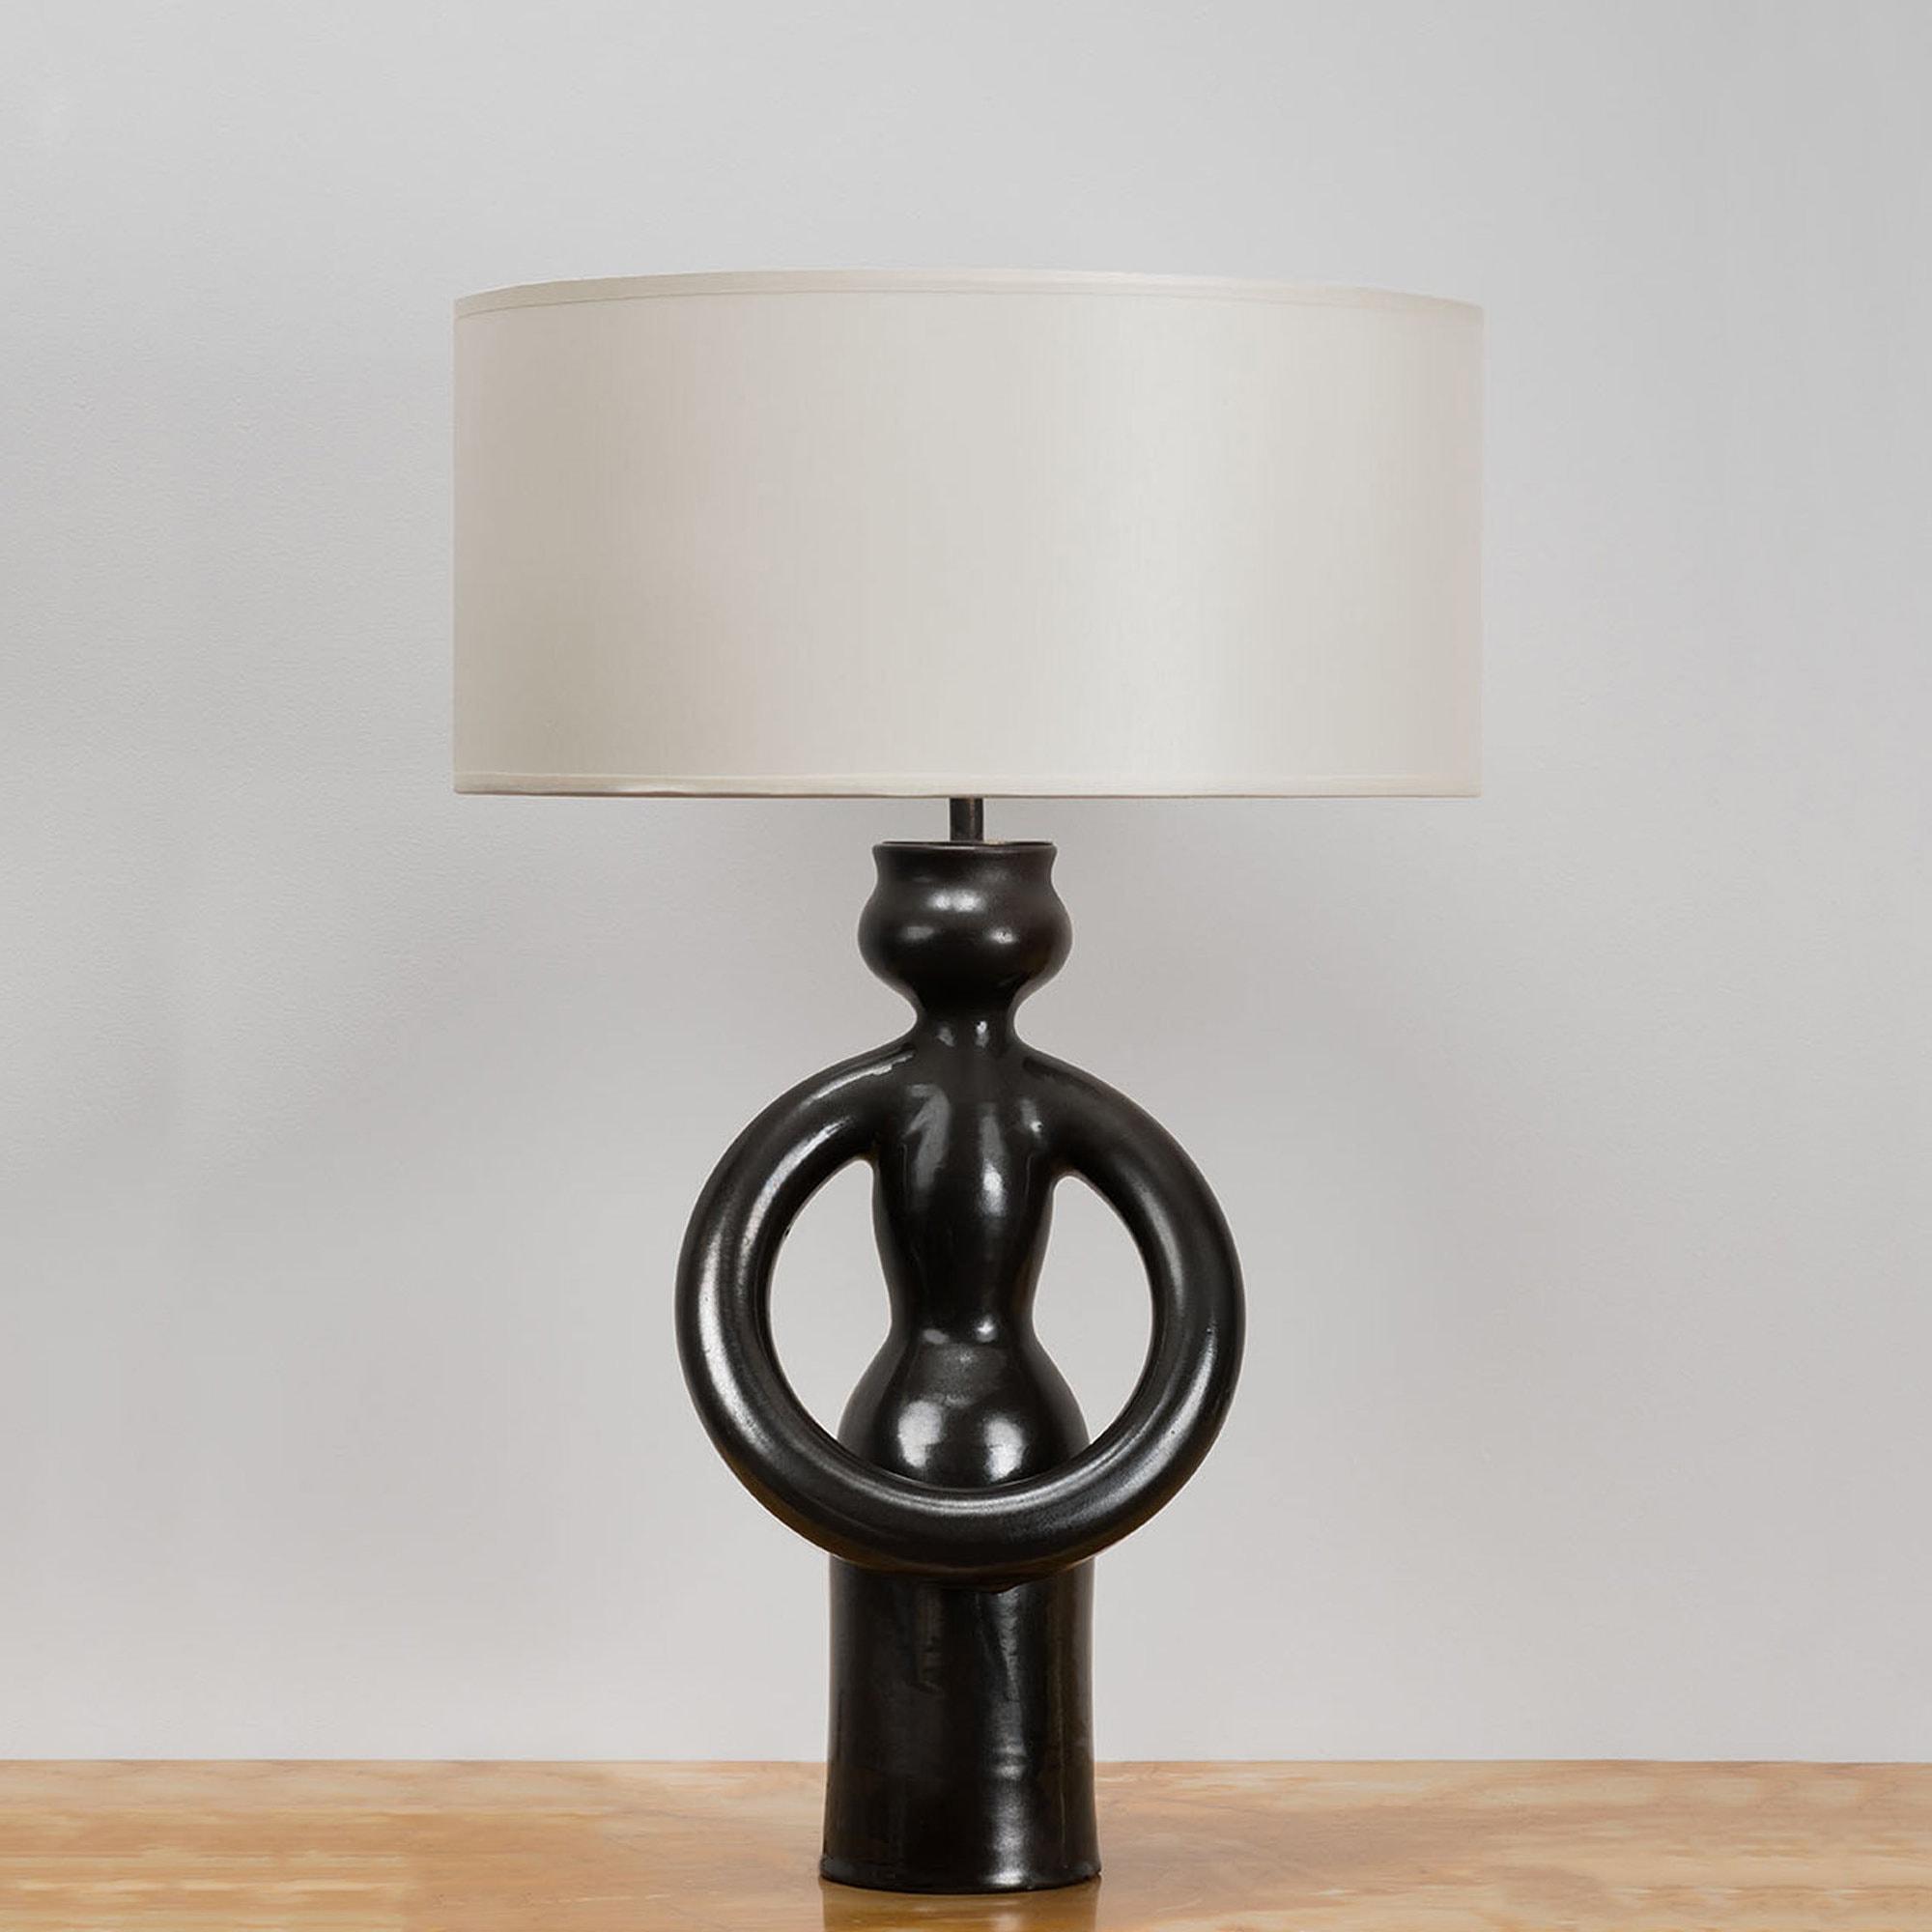 Atelier Madoura – Suzanne Ramie, Lampe de table (vendue), vue 01